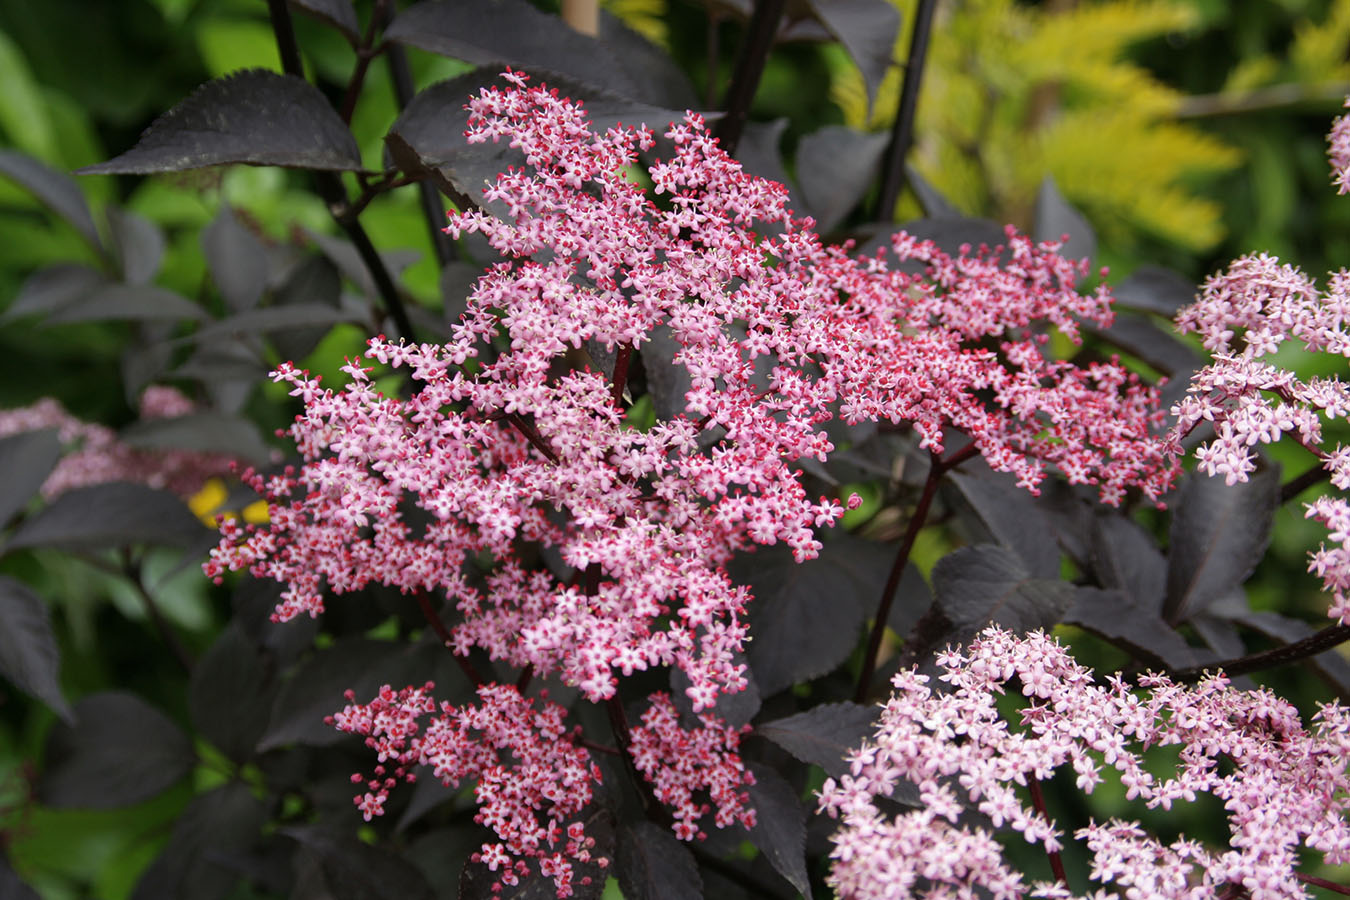 Black beauty elderberry sambucus nigra proven winners 4 pot black beauty elderberry sambucus nigra proven winners 4 pot hirts gardens izmirmasajfo